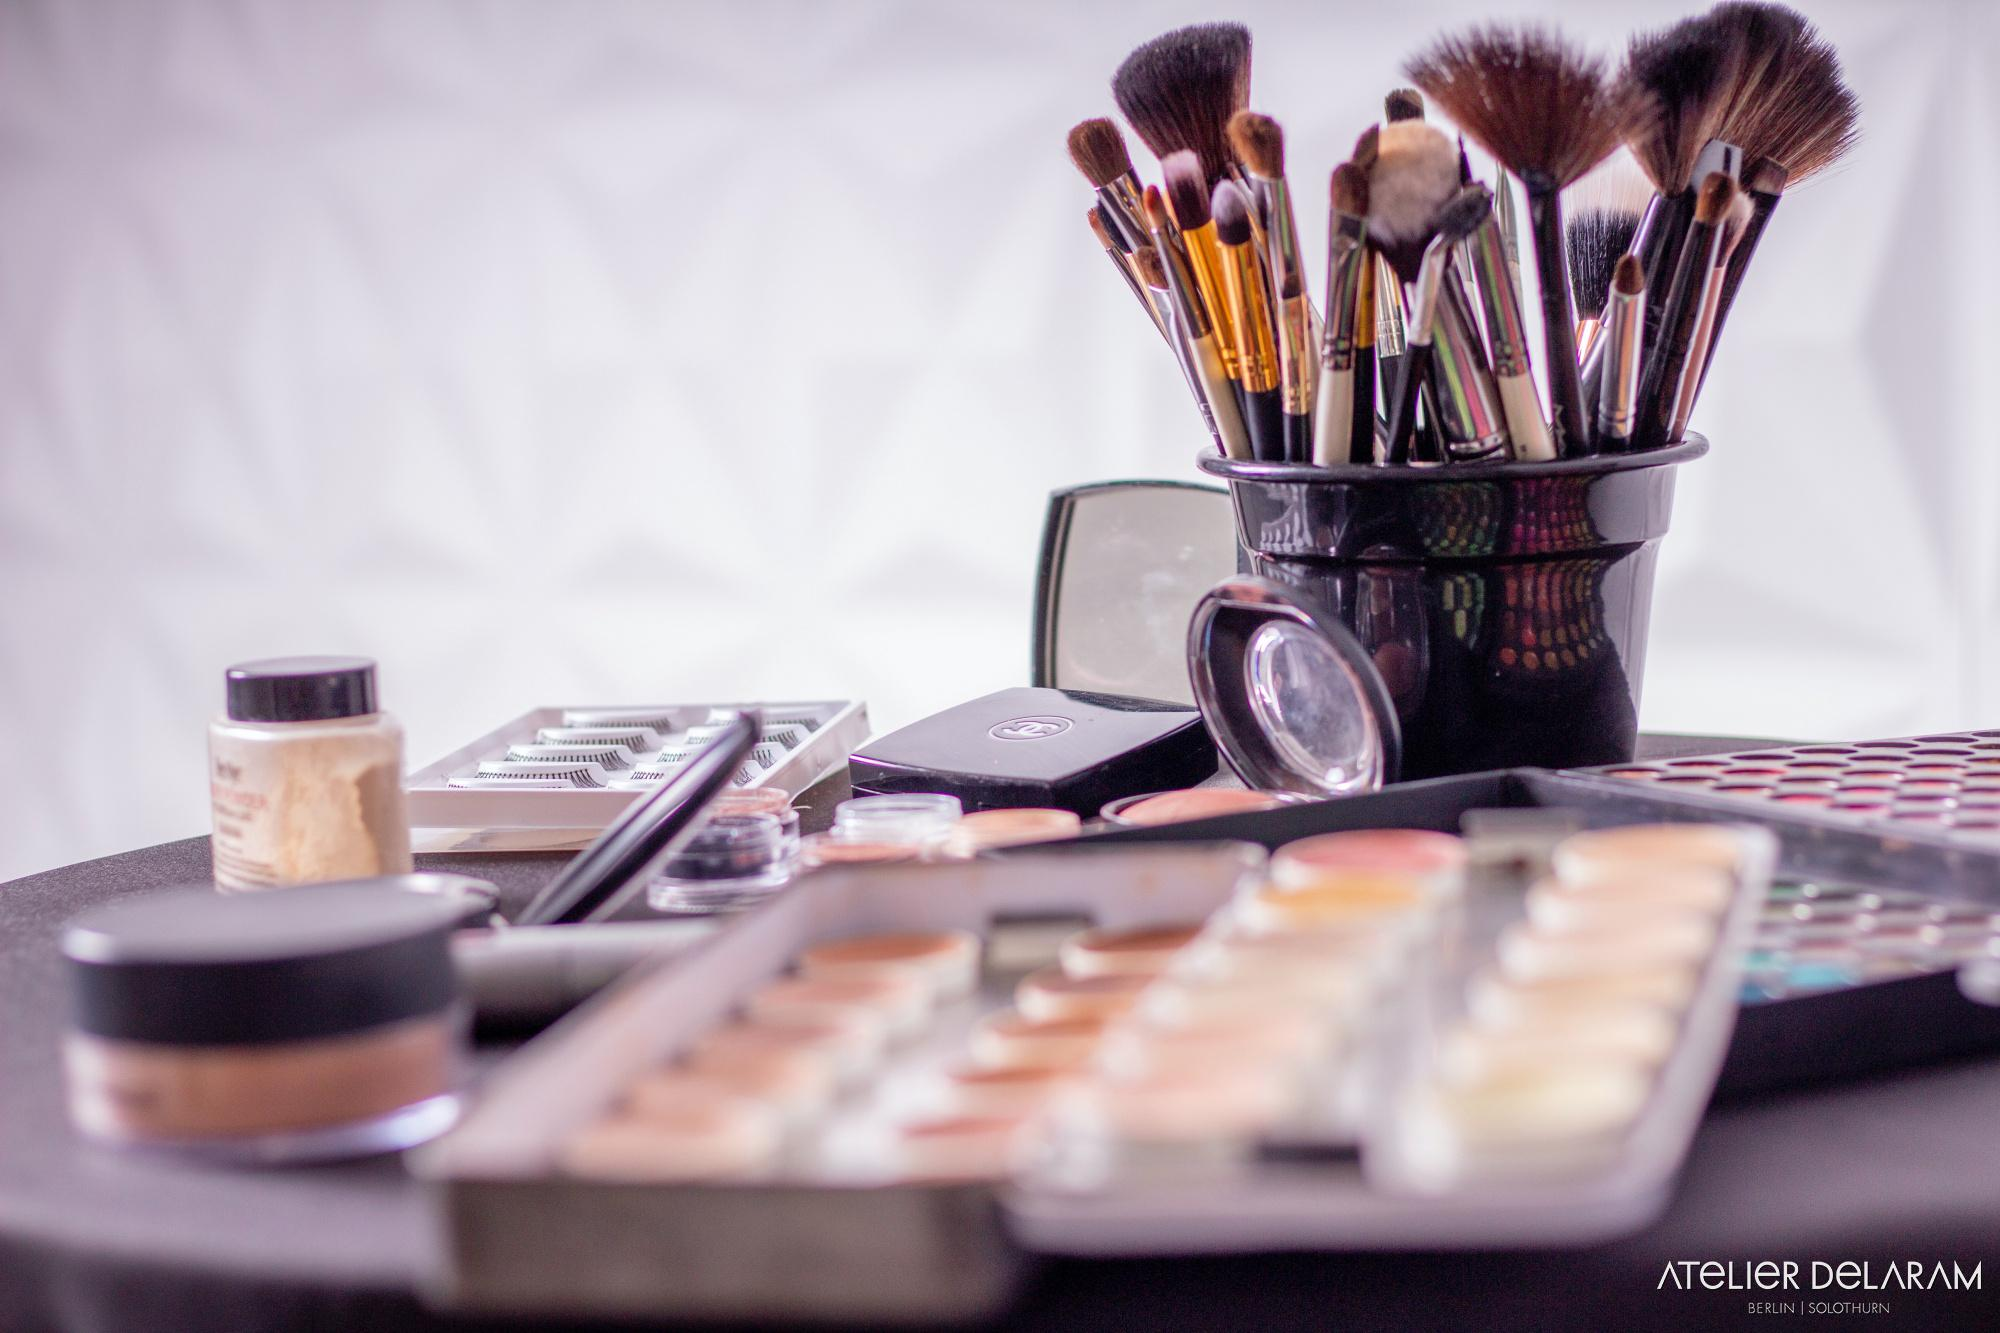 atelier_delaram_osmetik_makeup